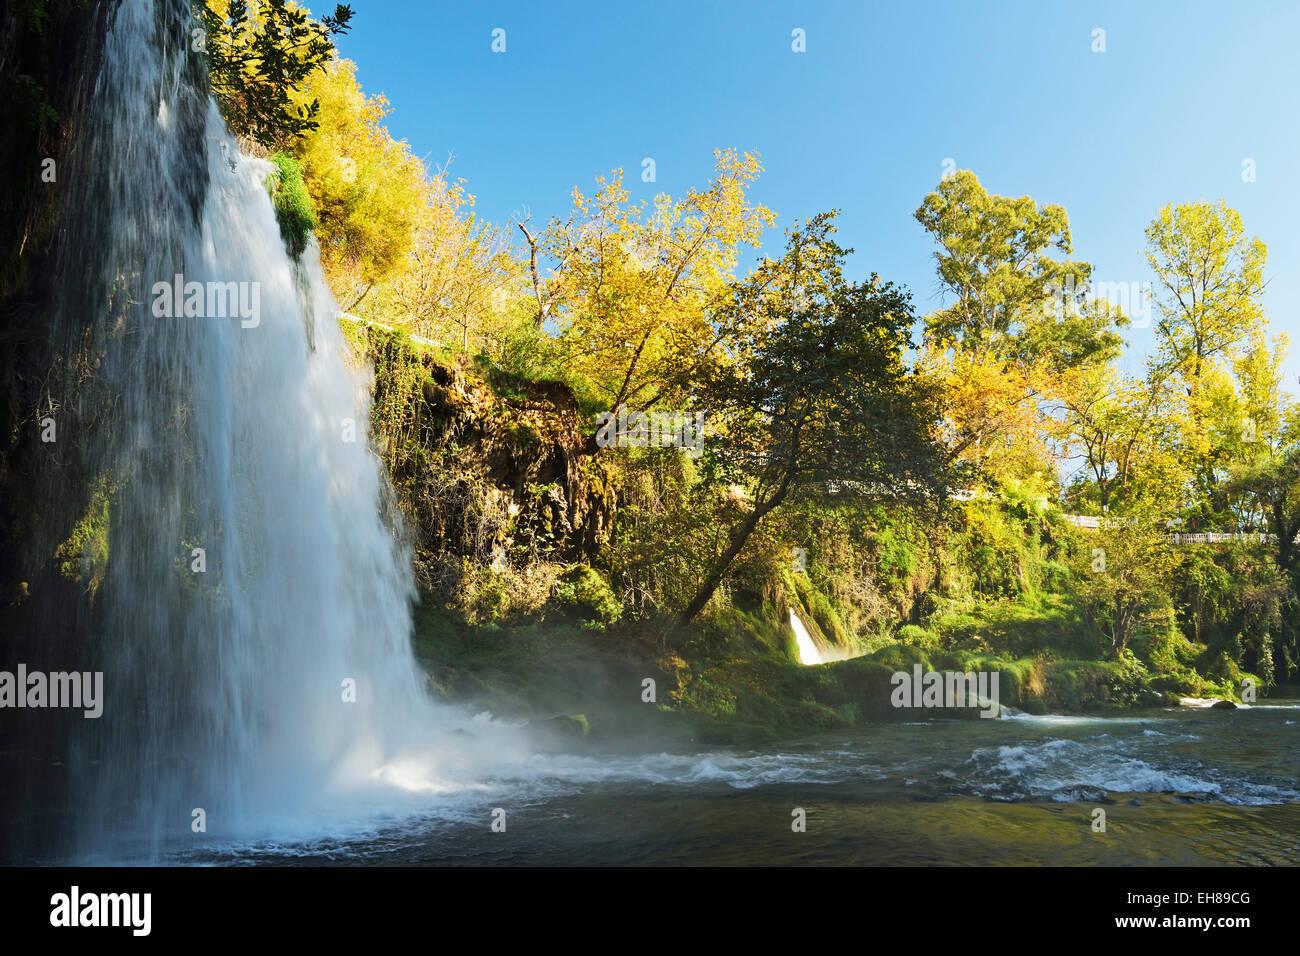 Duden Falls, Antalya, Antalya Province, Anatolia, Turkey, Asia Minor, Eurasia - Stock Image